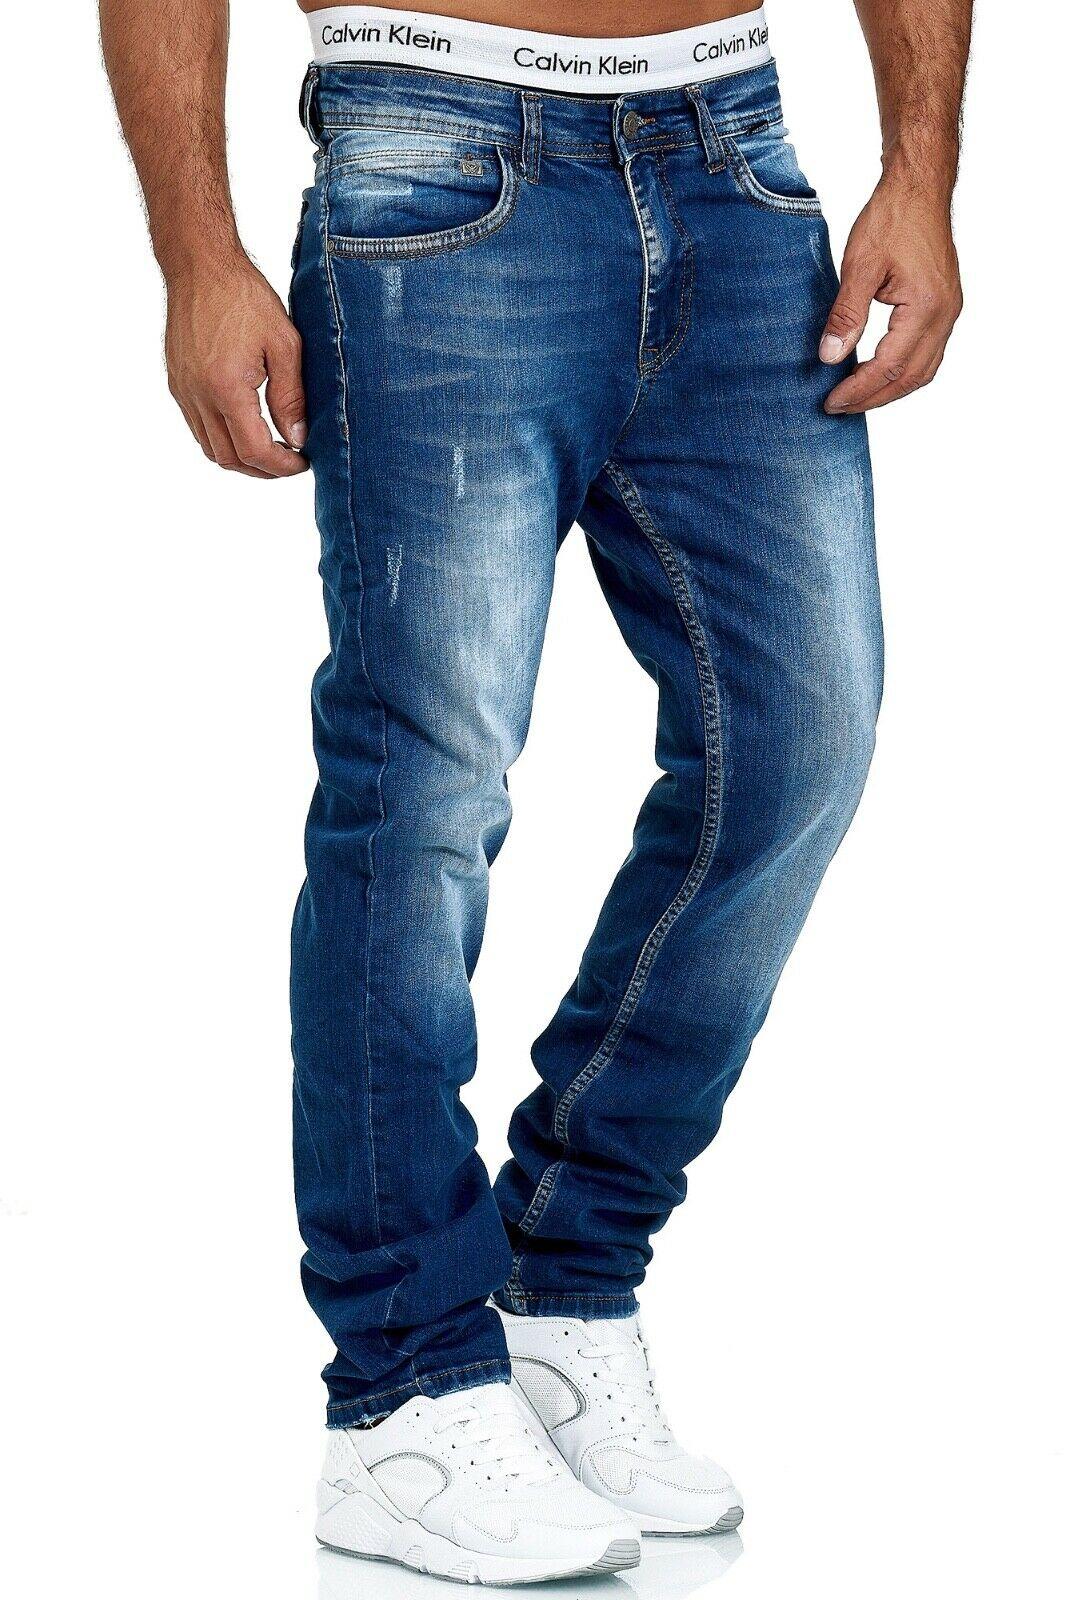 Herren-Jeans-Hose-Denim-KC-Black-Washed-Straight-Cut-Regular-Dicke-Naht-naehte Indexbild 38